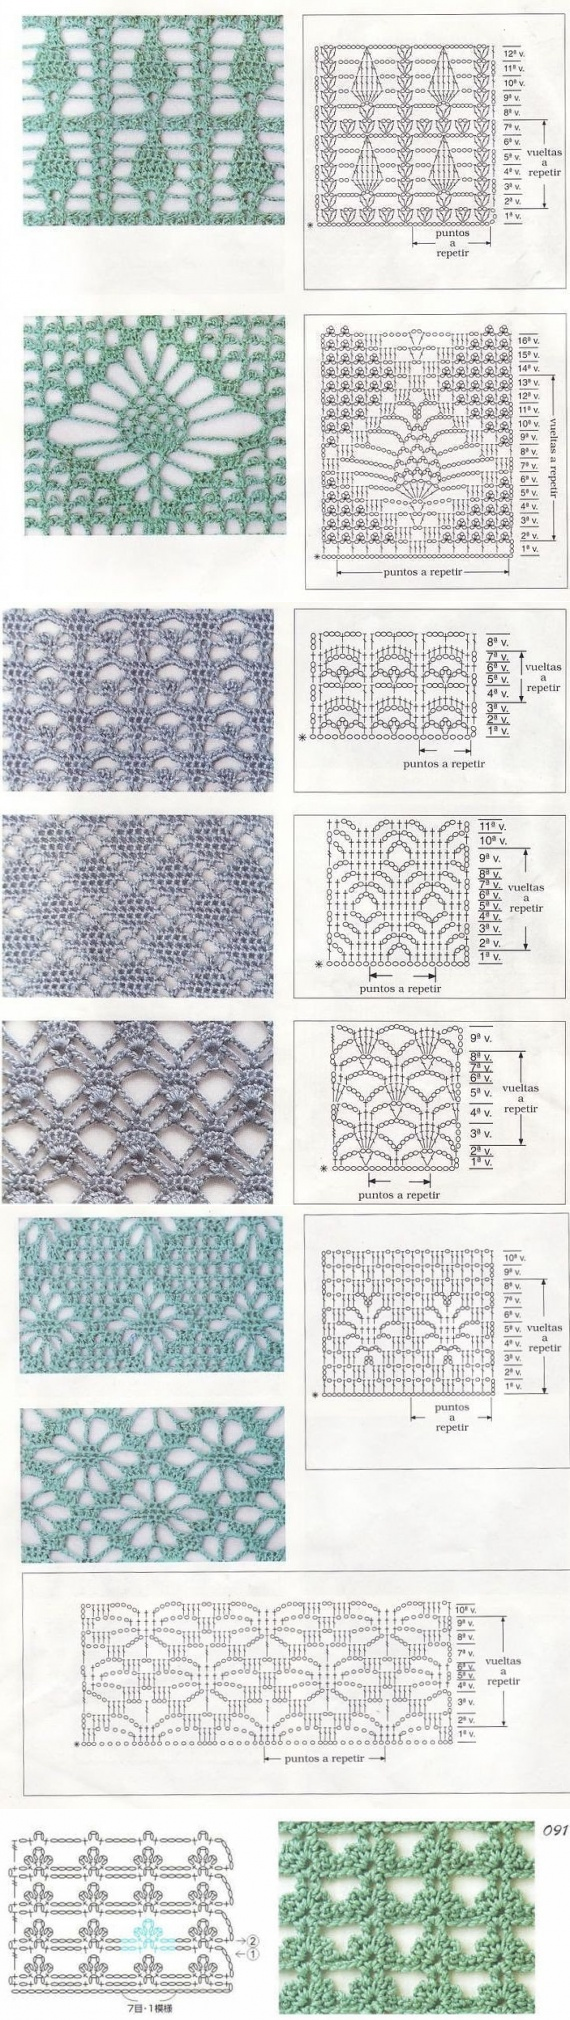 handlife.ru | Crochet Patrones | Pinterest | Puntadas, Ganchillo y ...